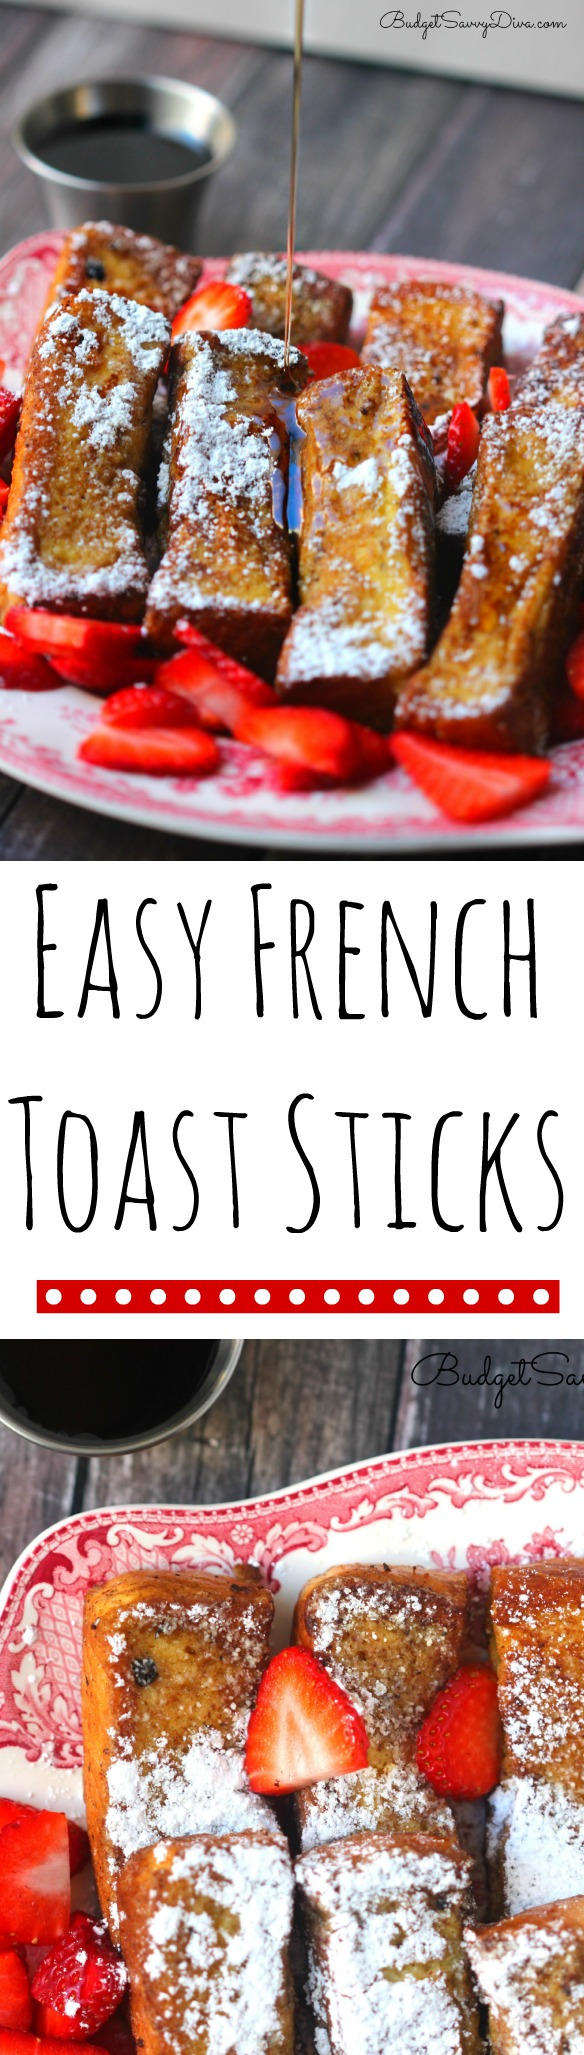 Easy French Toast Sticks Recipe